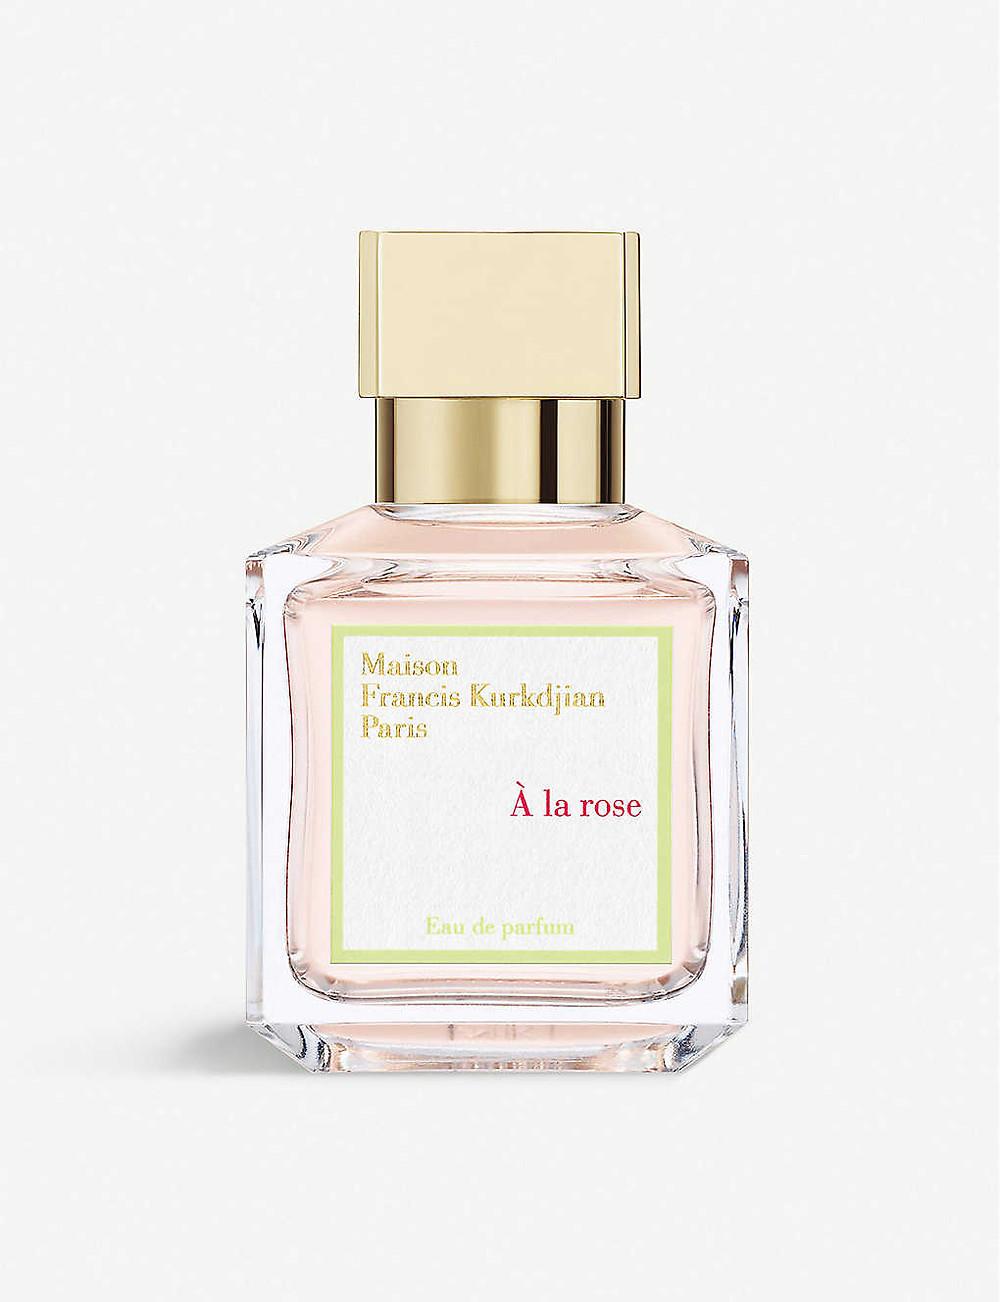 Maison Francis Kurkdjian A la Rose Eau de parfum